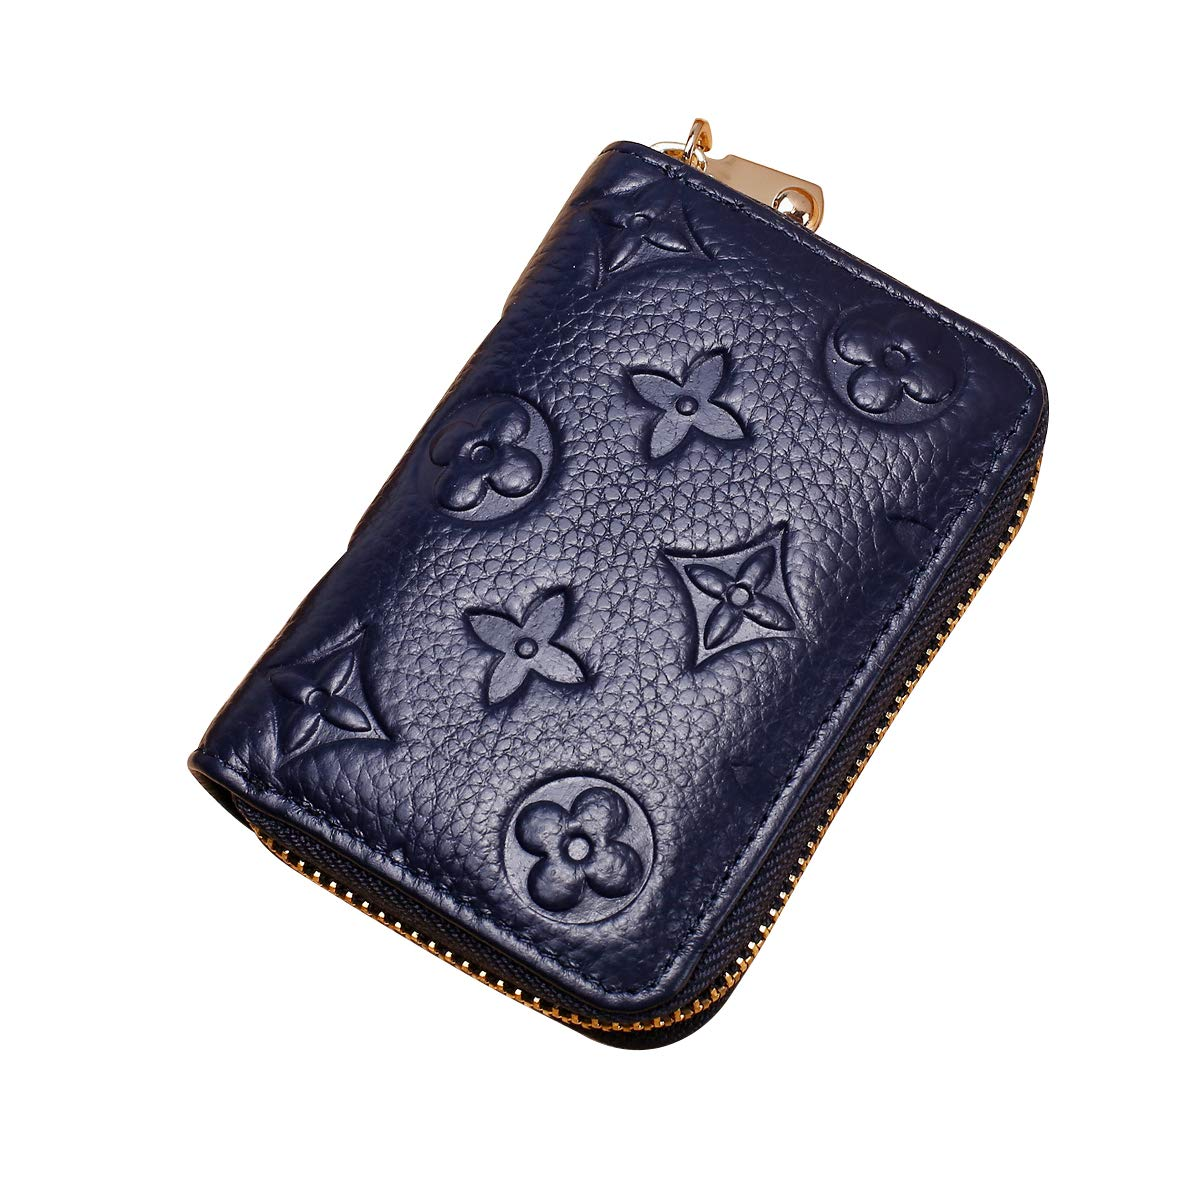 Auner Womens Wallet RFID Blocking Genuine Leather Multi Credit Card Holder Zipper Small Wallets - Blue